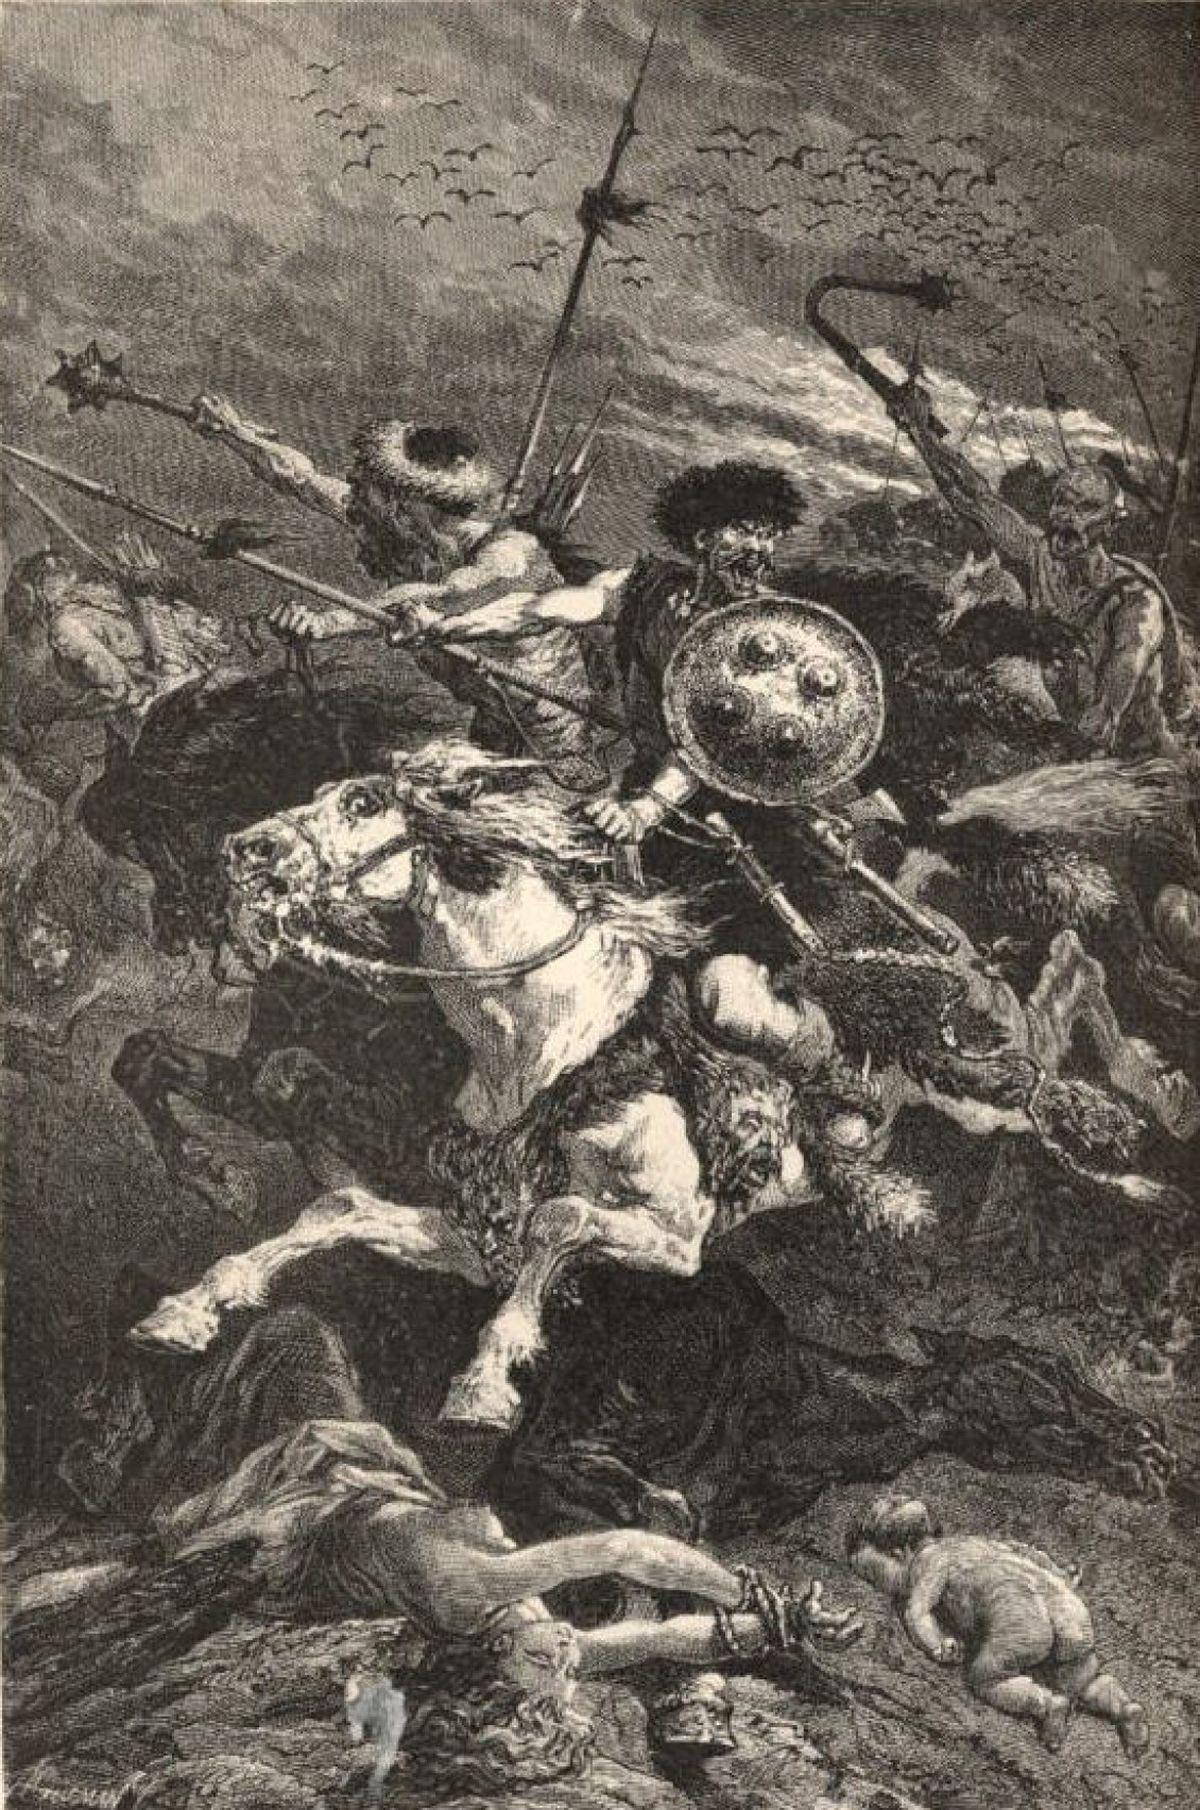 The Huns at the Battle of Chalons, Alphonse de Neuville